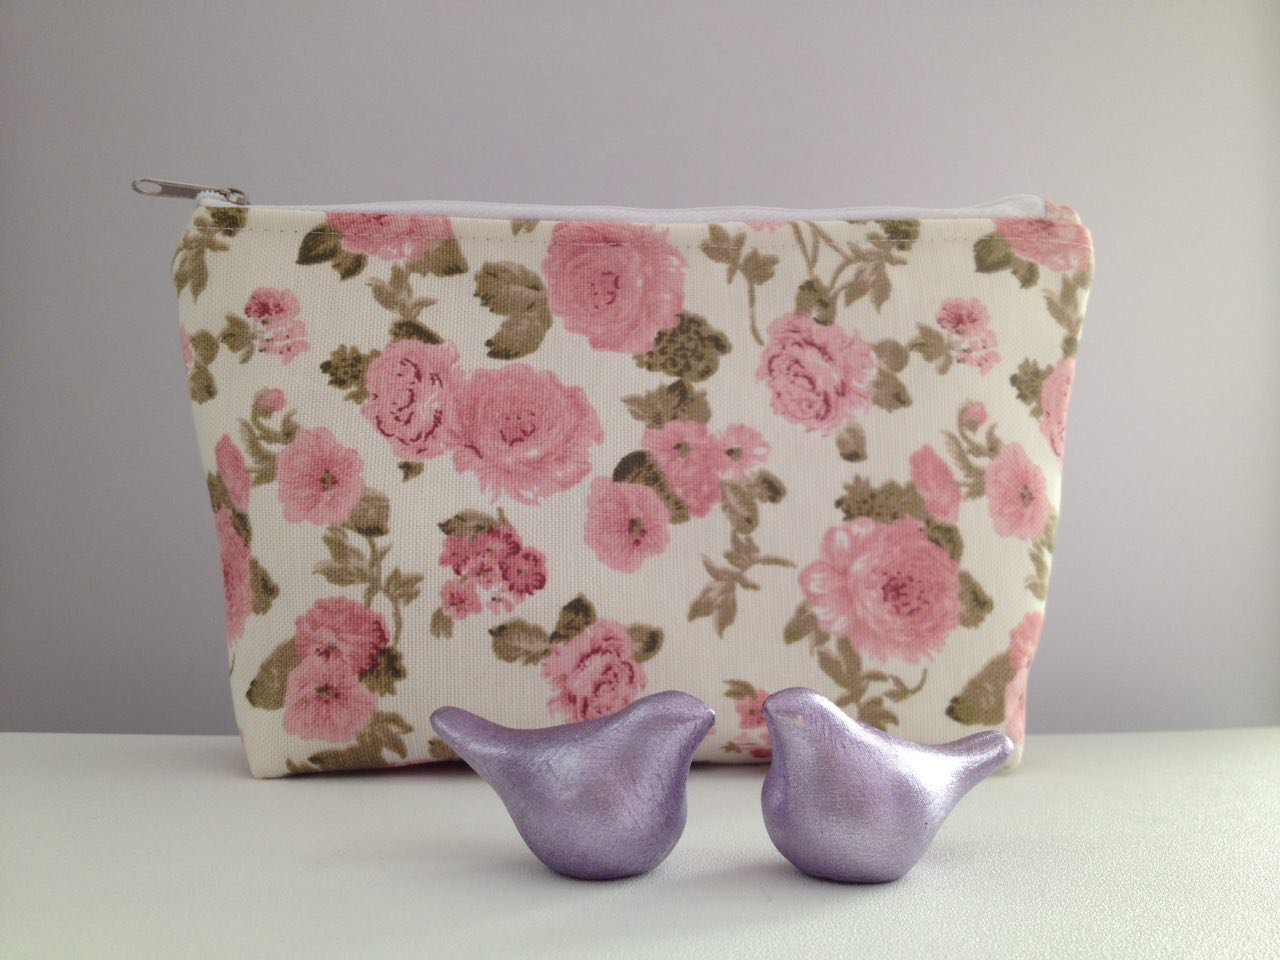 کیف لوازم آرایش آنام طرح گل صورتی